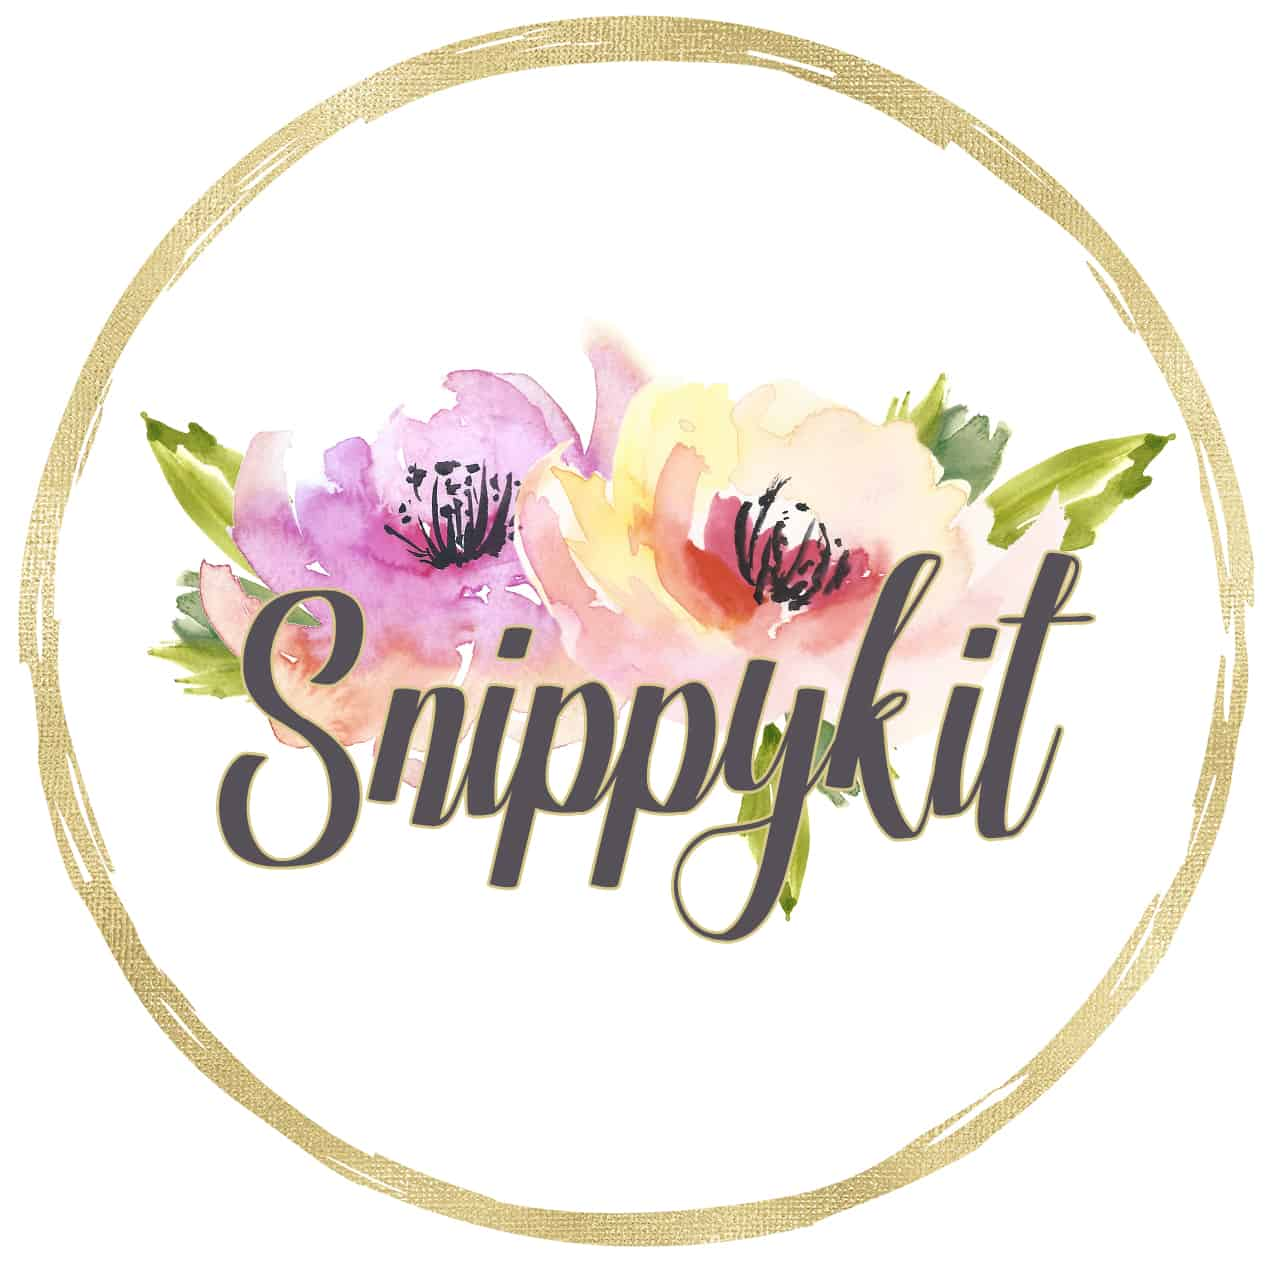 Snippykit